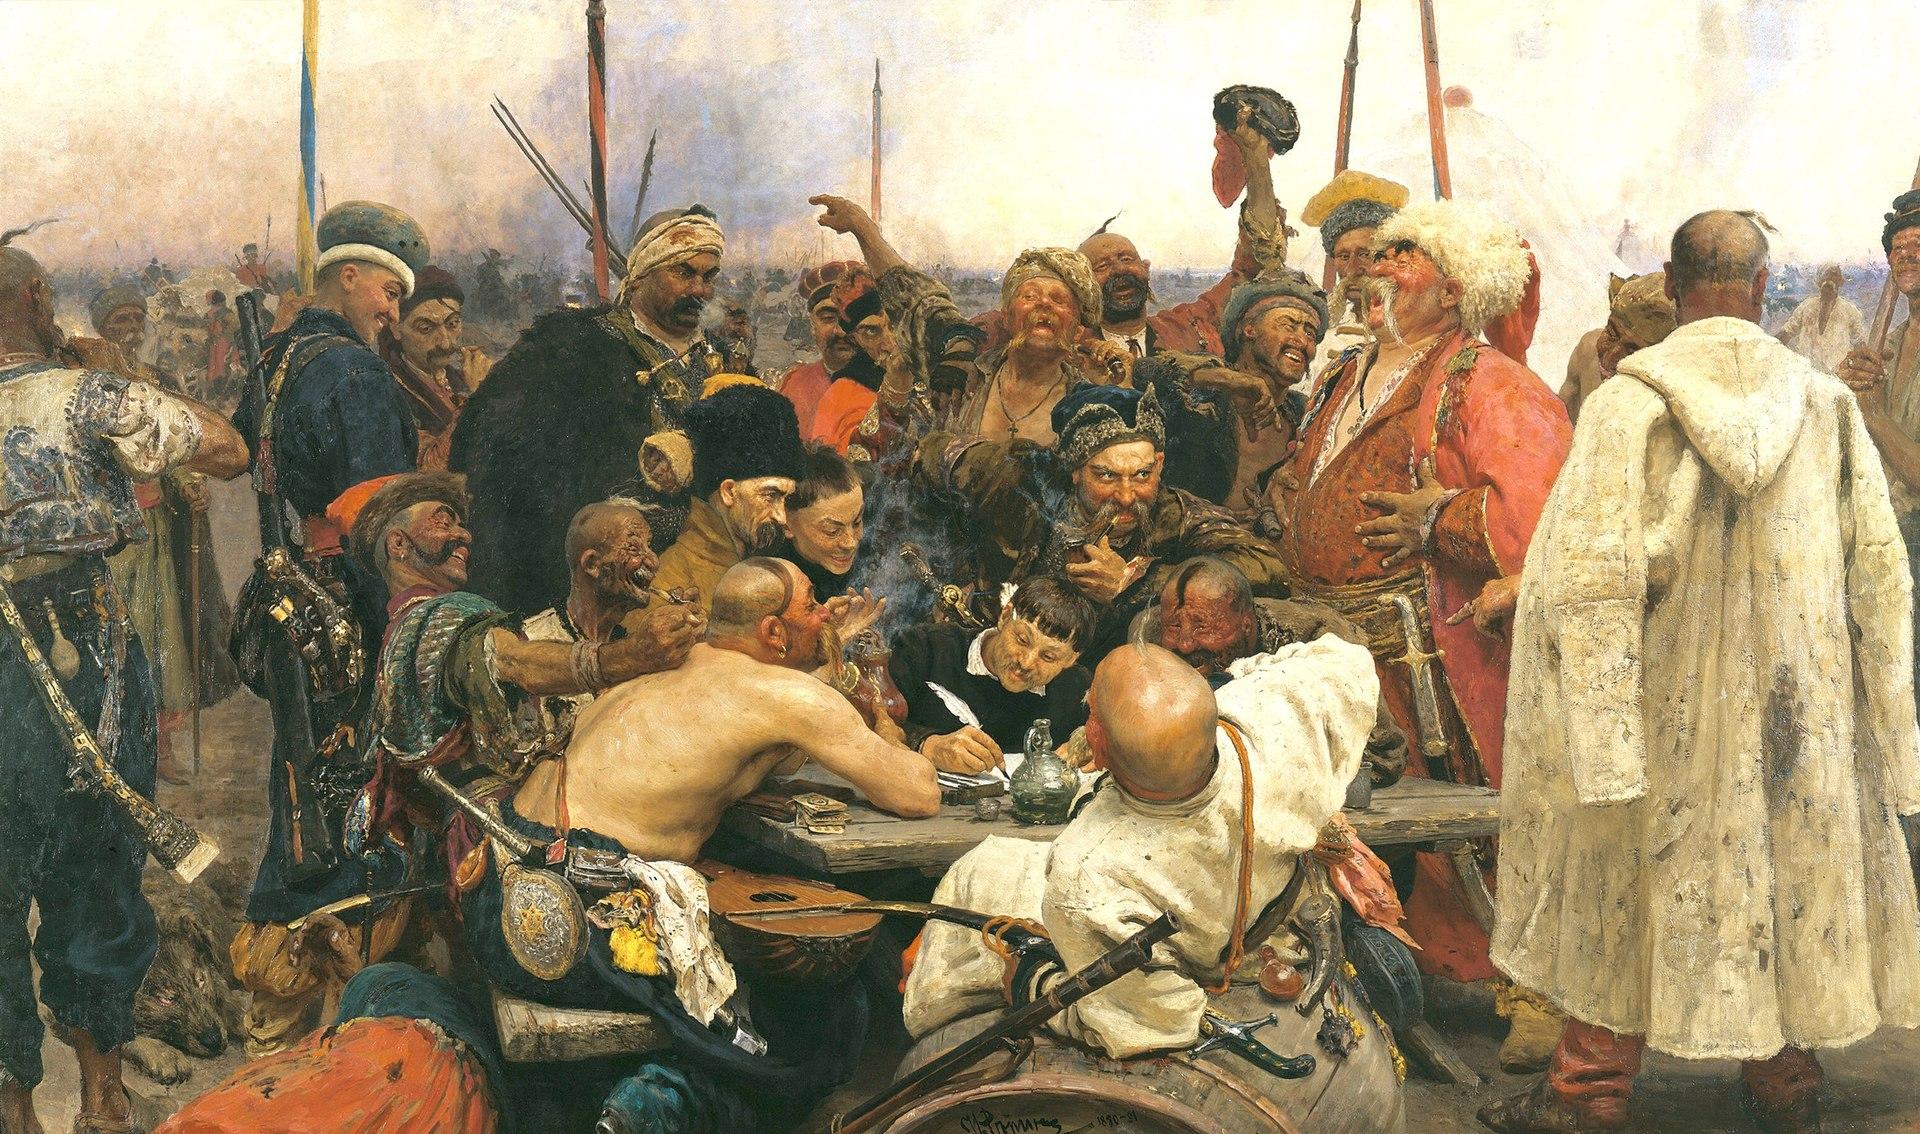 1920px-Repin_Cossacks.jpg